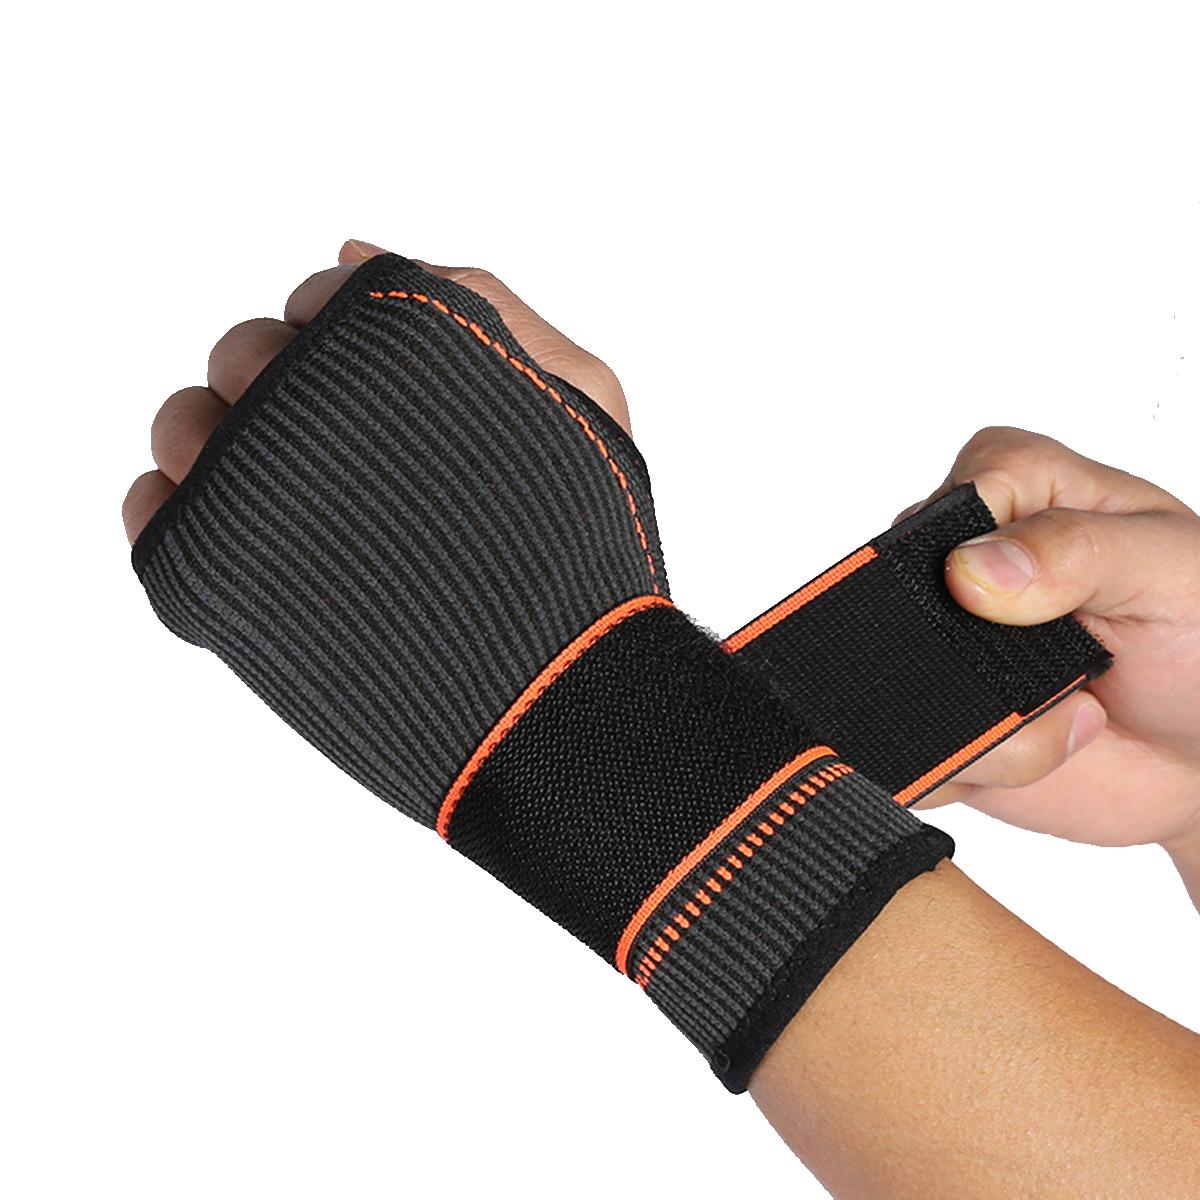 1Pc Adjustable Prevent fatigue Wrist Hand Palm Brace Strap Wraps Hand Prevent Sprains